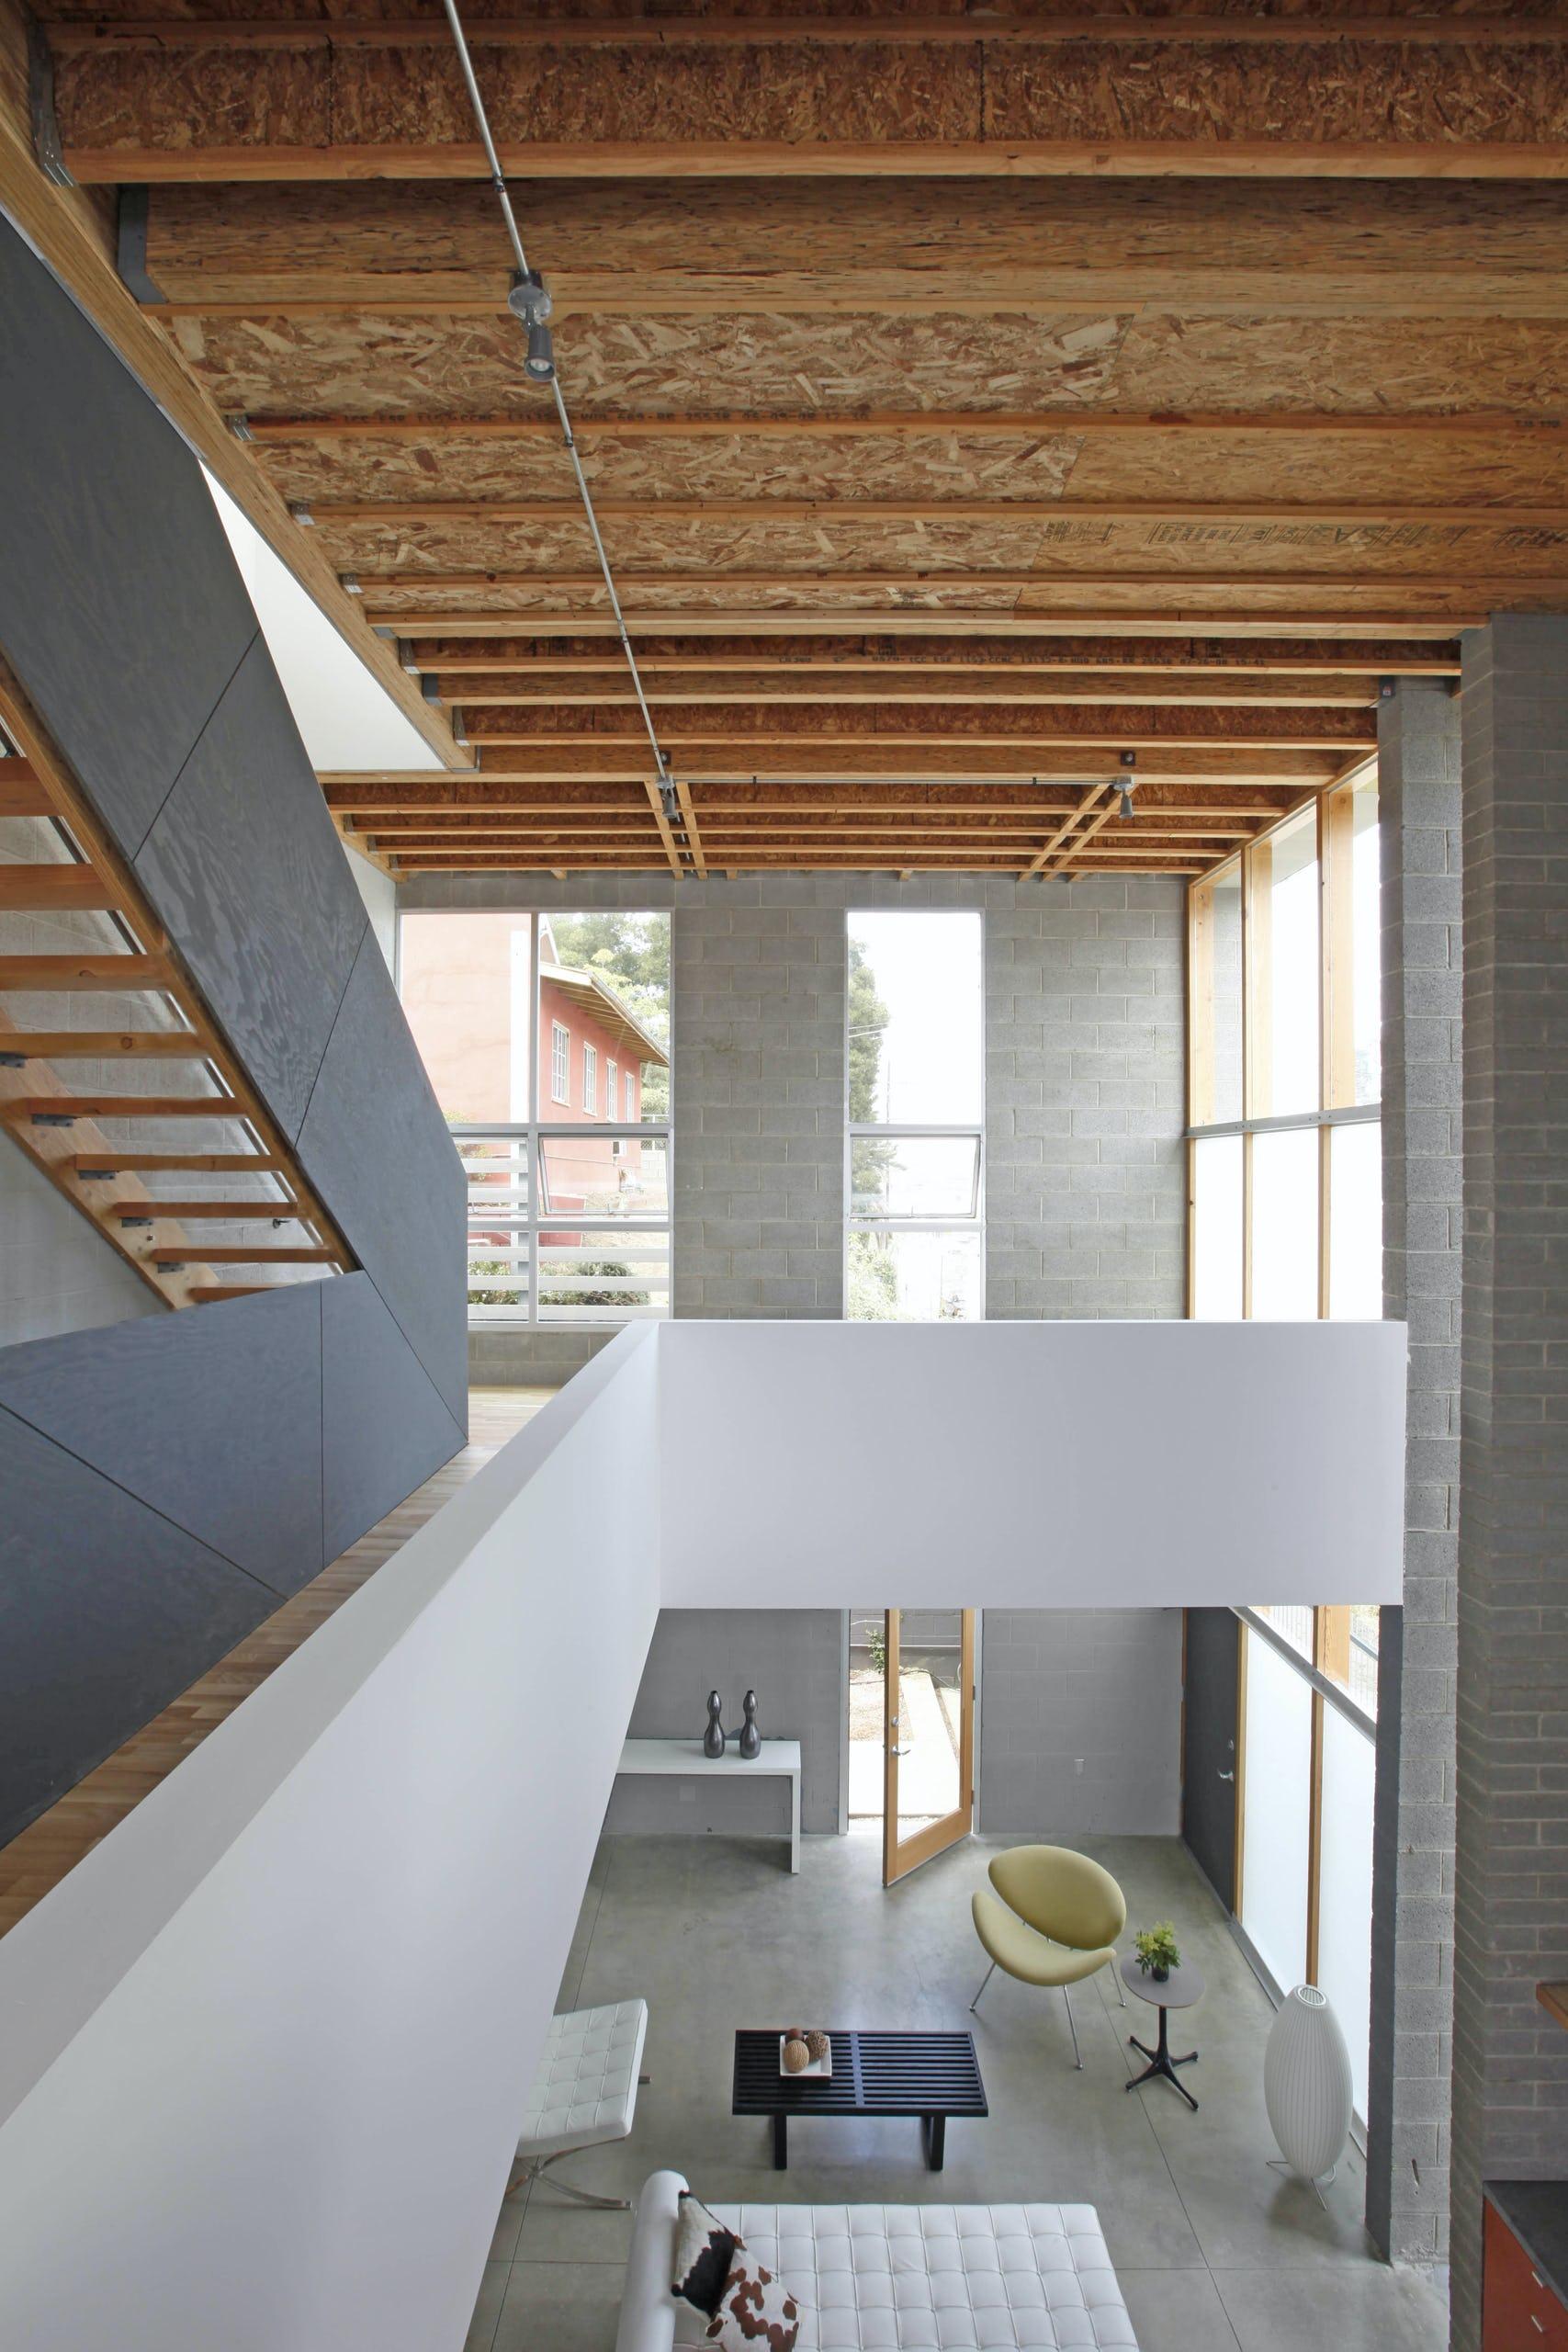 Interior 2 story